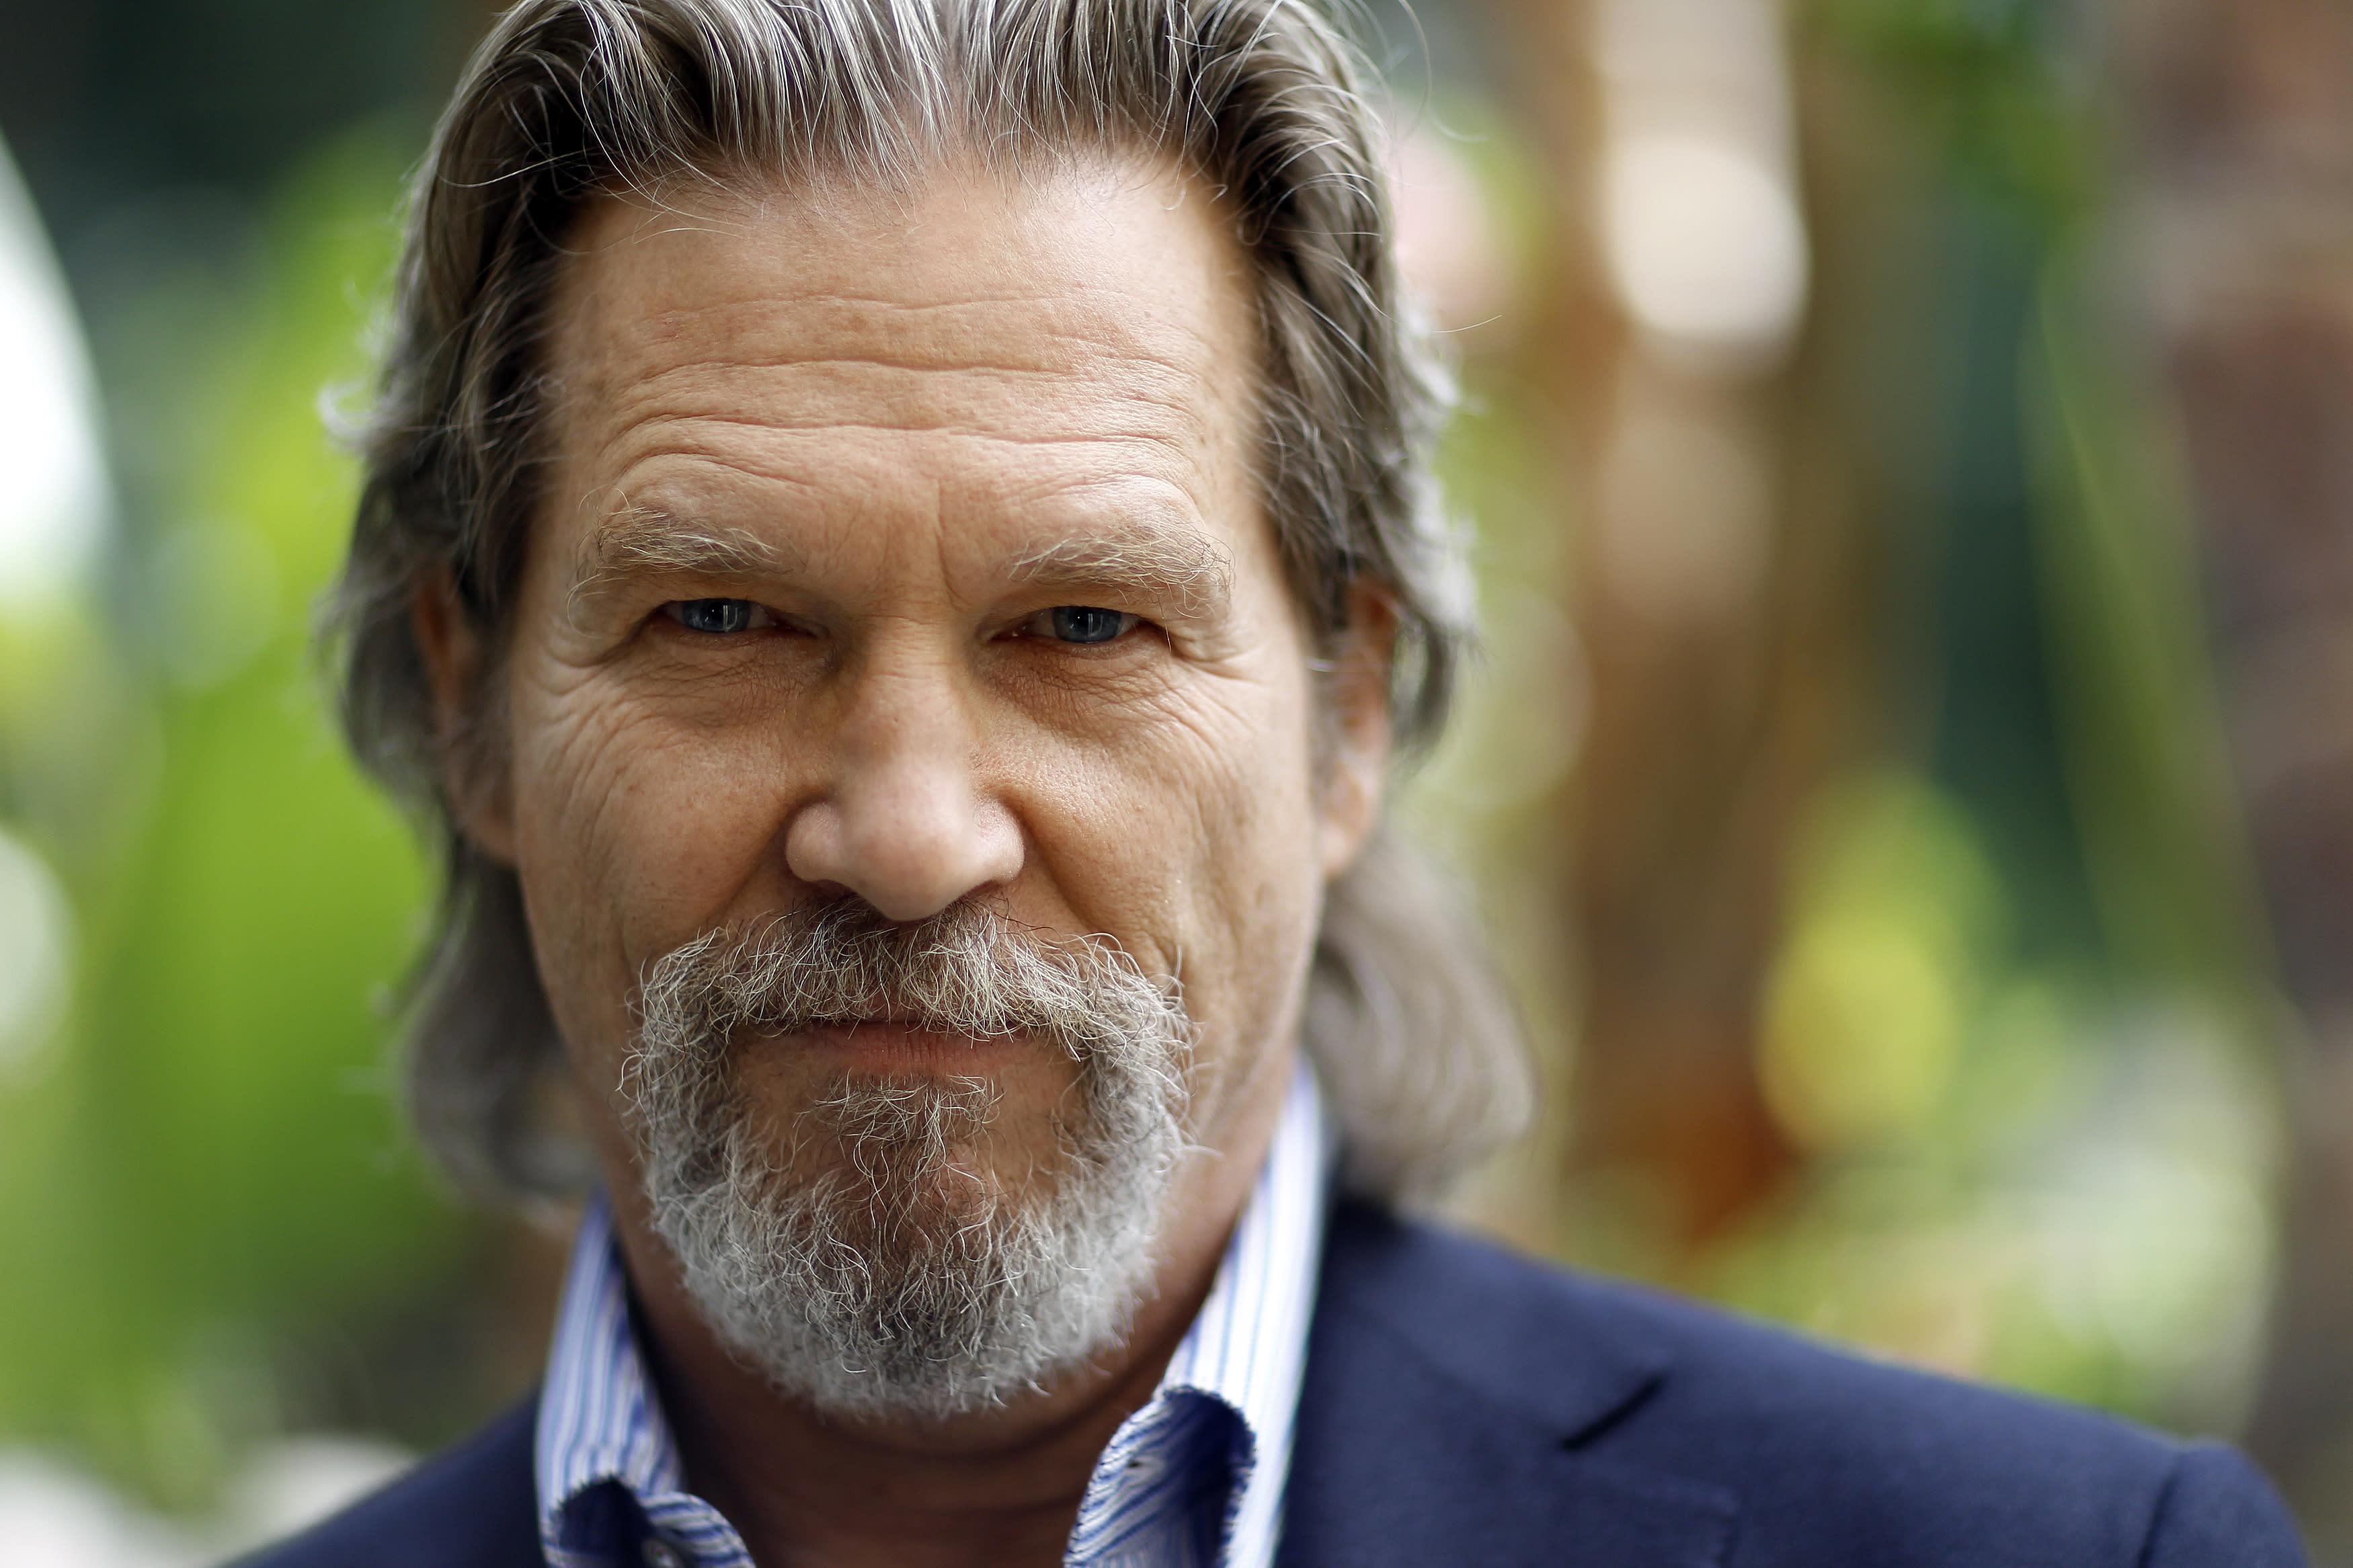 Celebrities send Jeff Bridges encouragement amid cancer diagnosis: 'We're pulling for you'